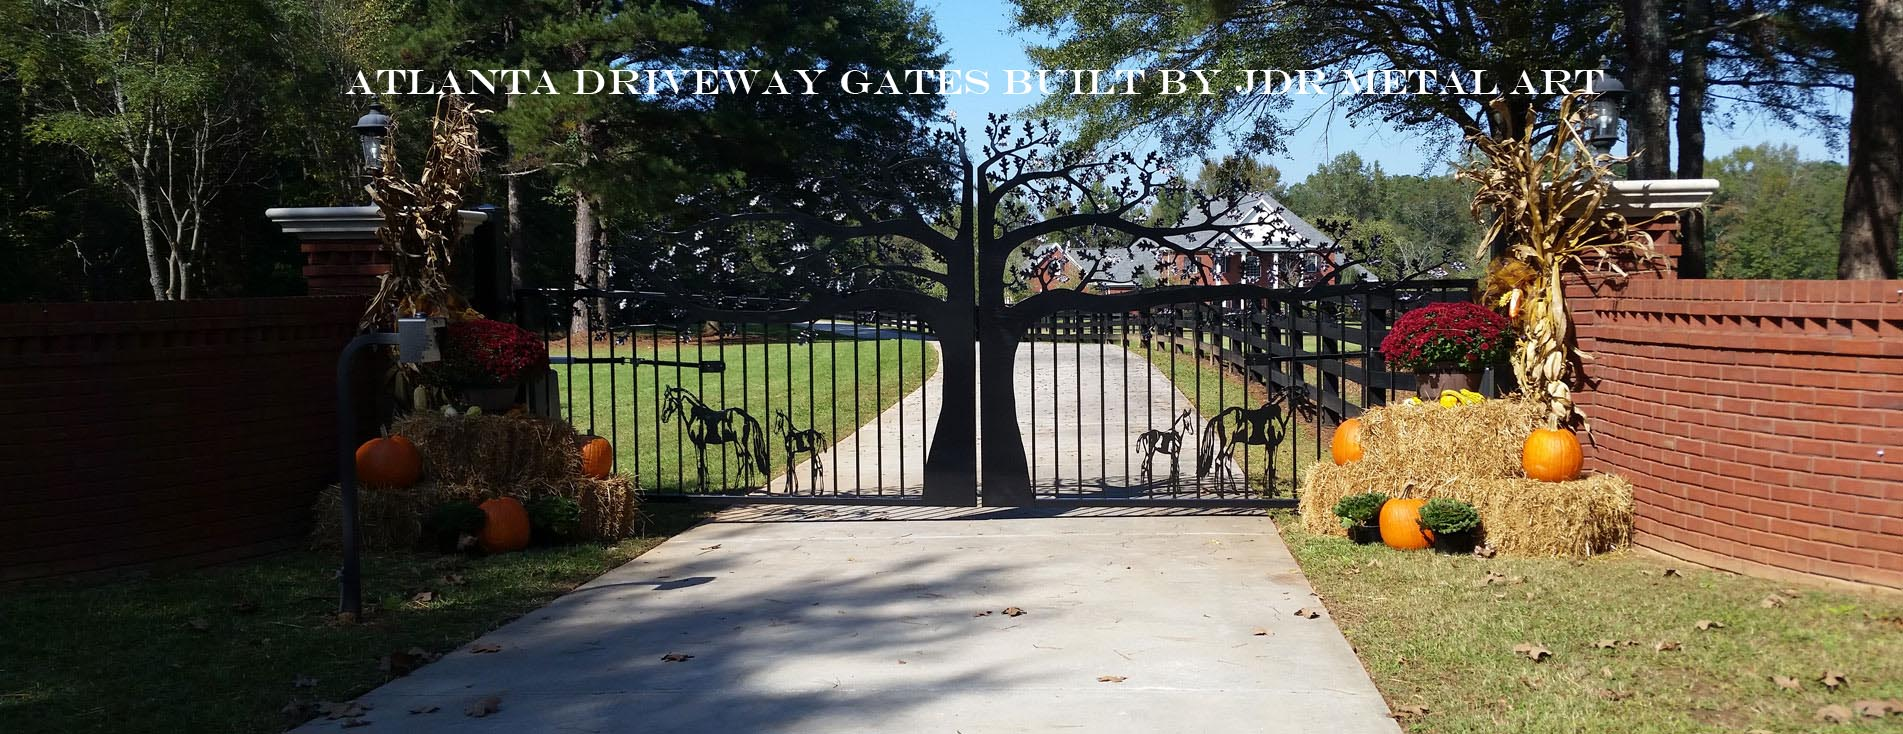 Atlanta ornamental driveway gates